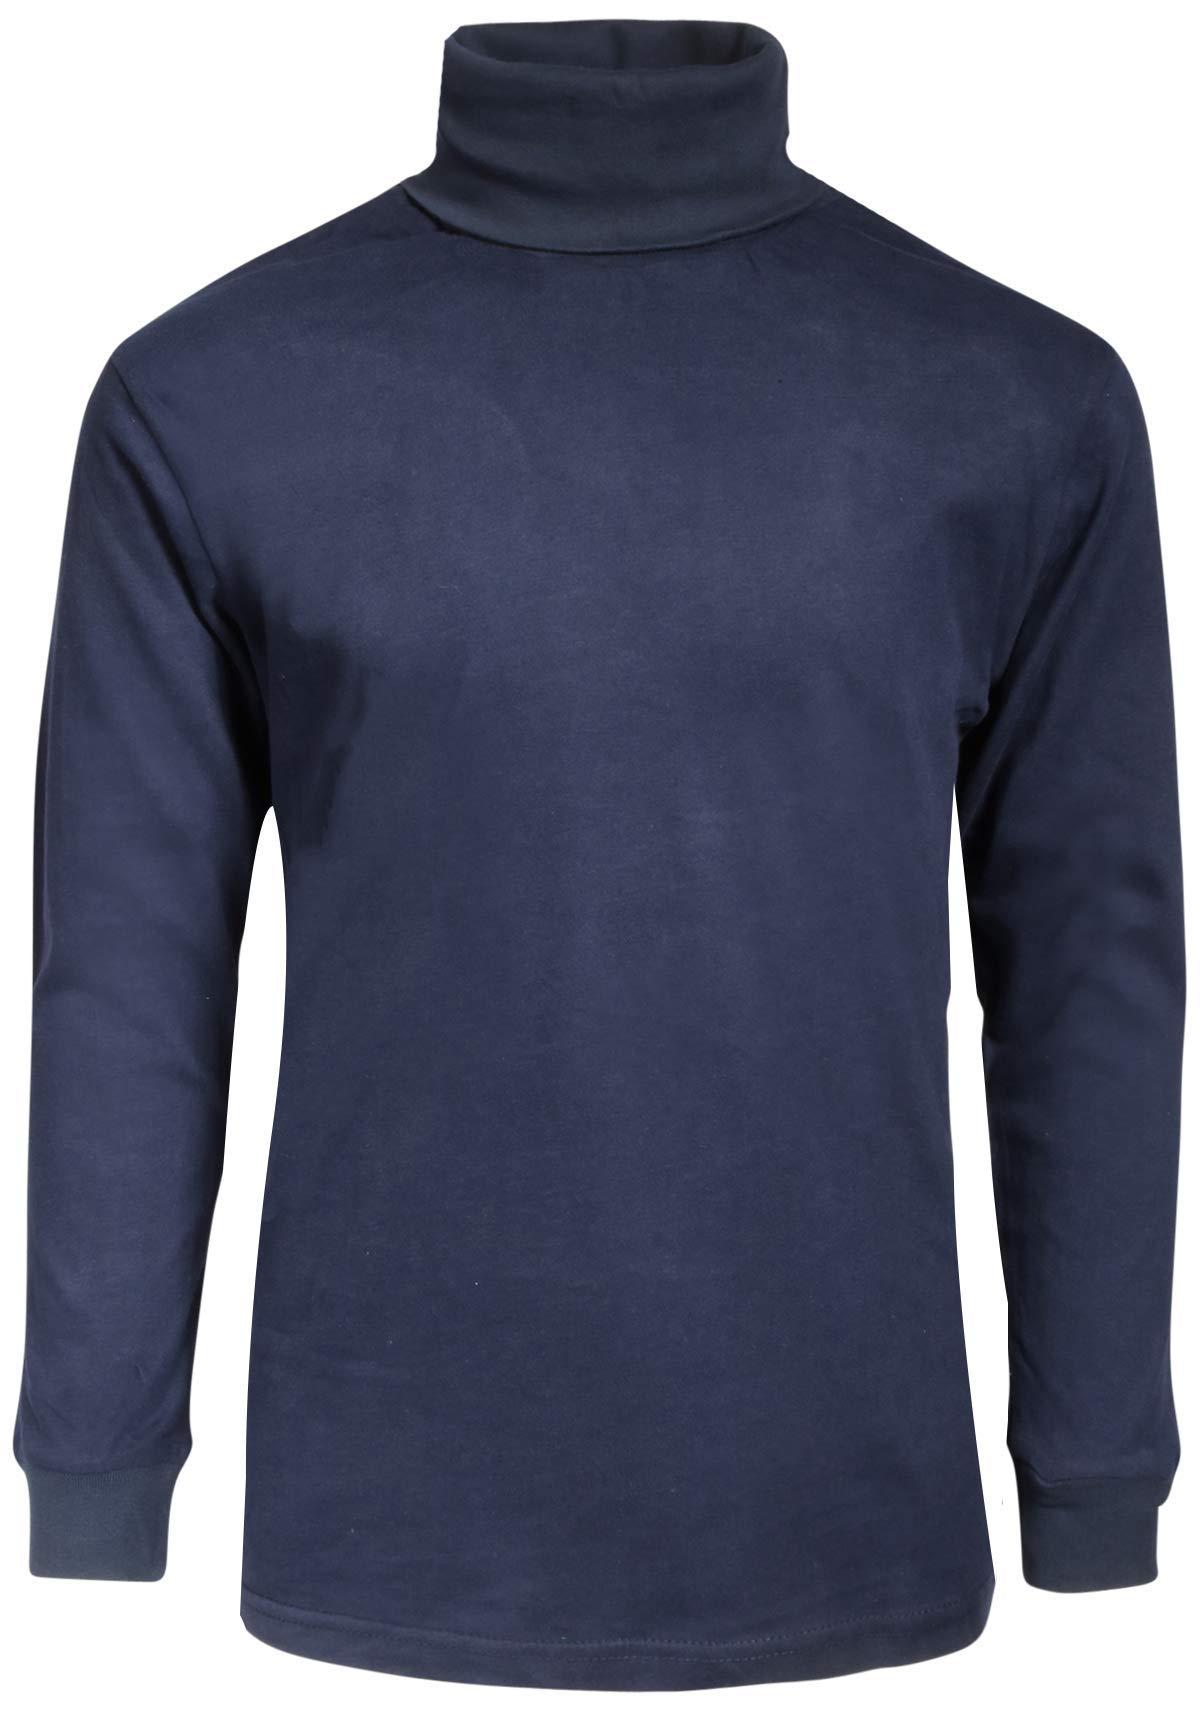 Beverly Hills Polo Club Boy's School Uniform 2-Pack Long Sleeve Turtleneck Shirts, Navy/Navy, 8/10' by Beverly Hills Polo Club (Image #2)